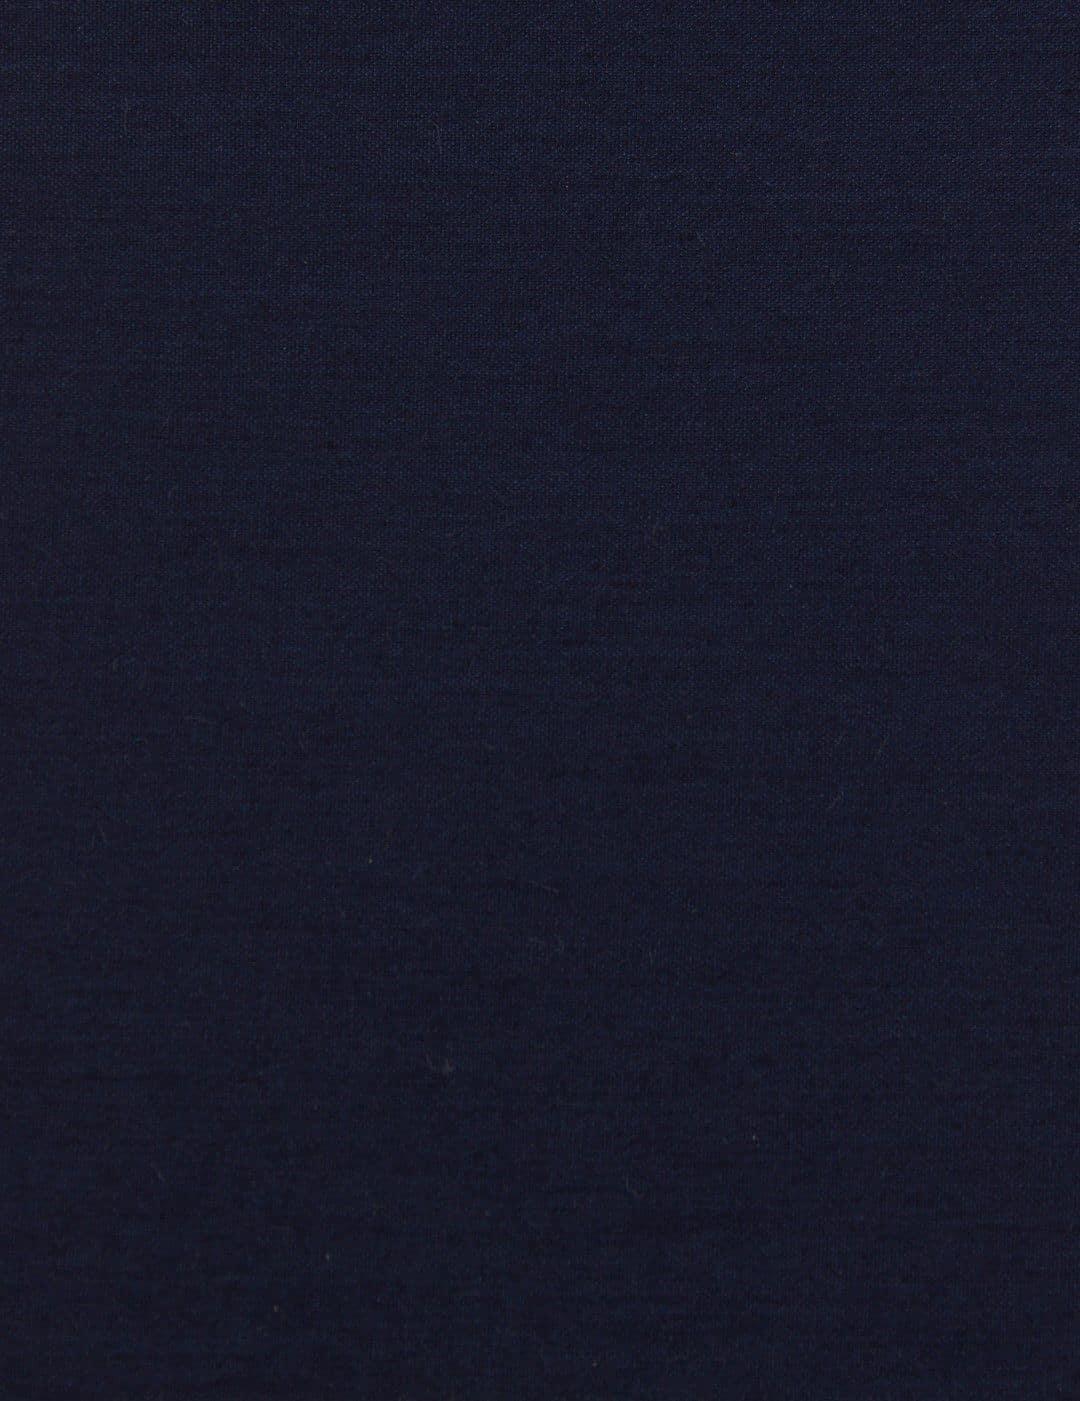 Plain Dark Blue shirt – Ready to wear